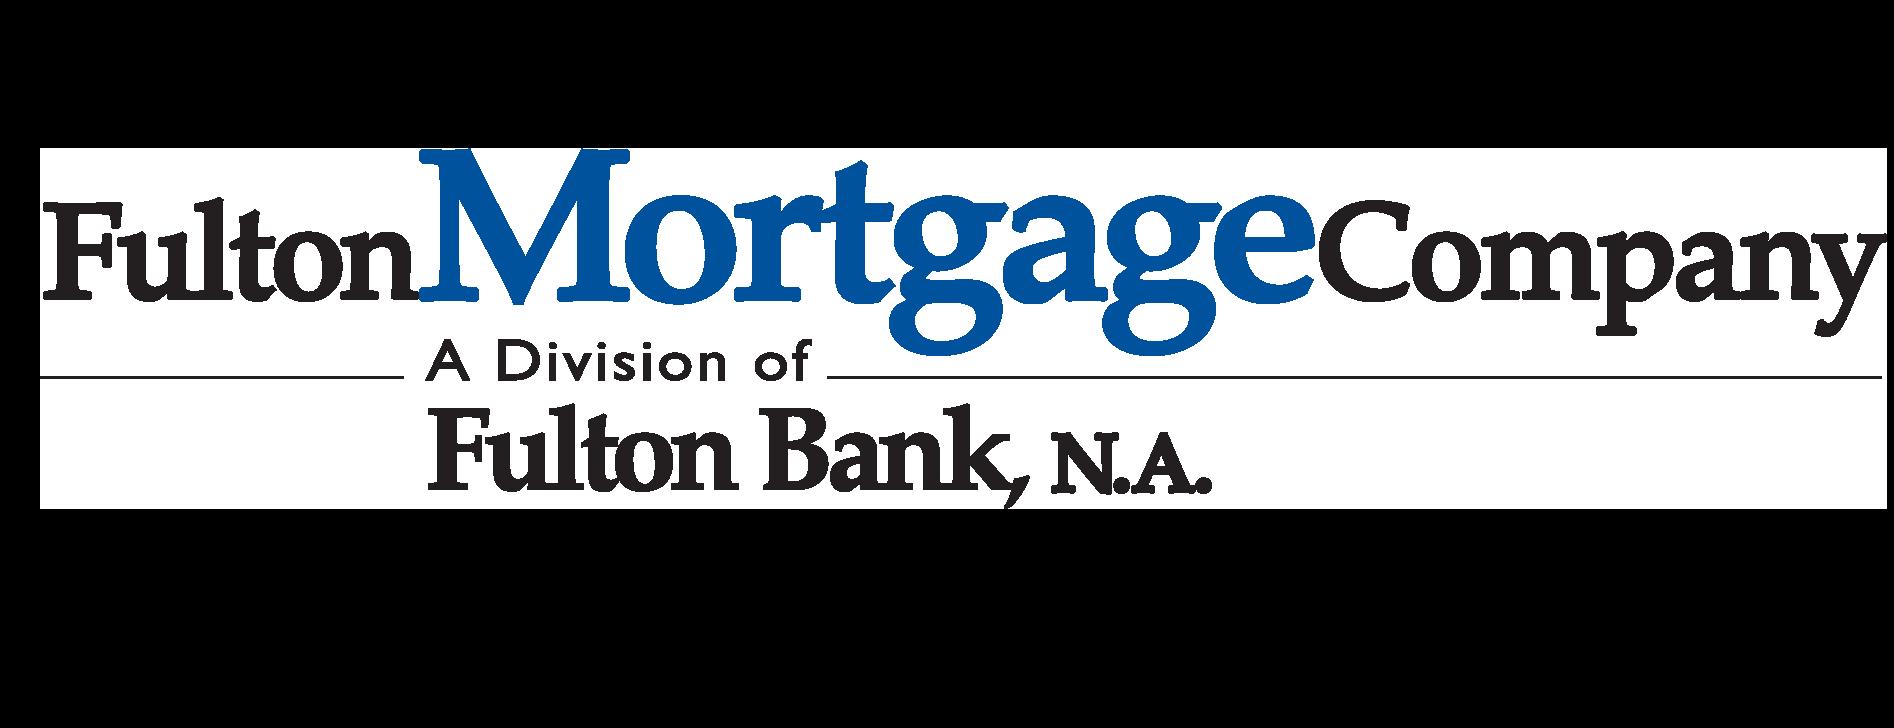 Fulton Mortage Company Logo